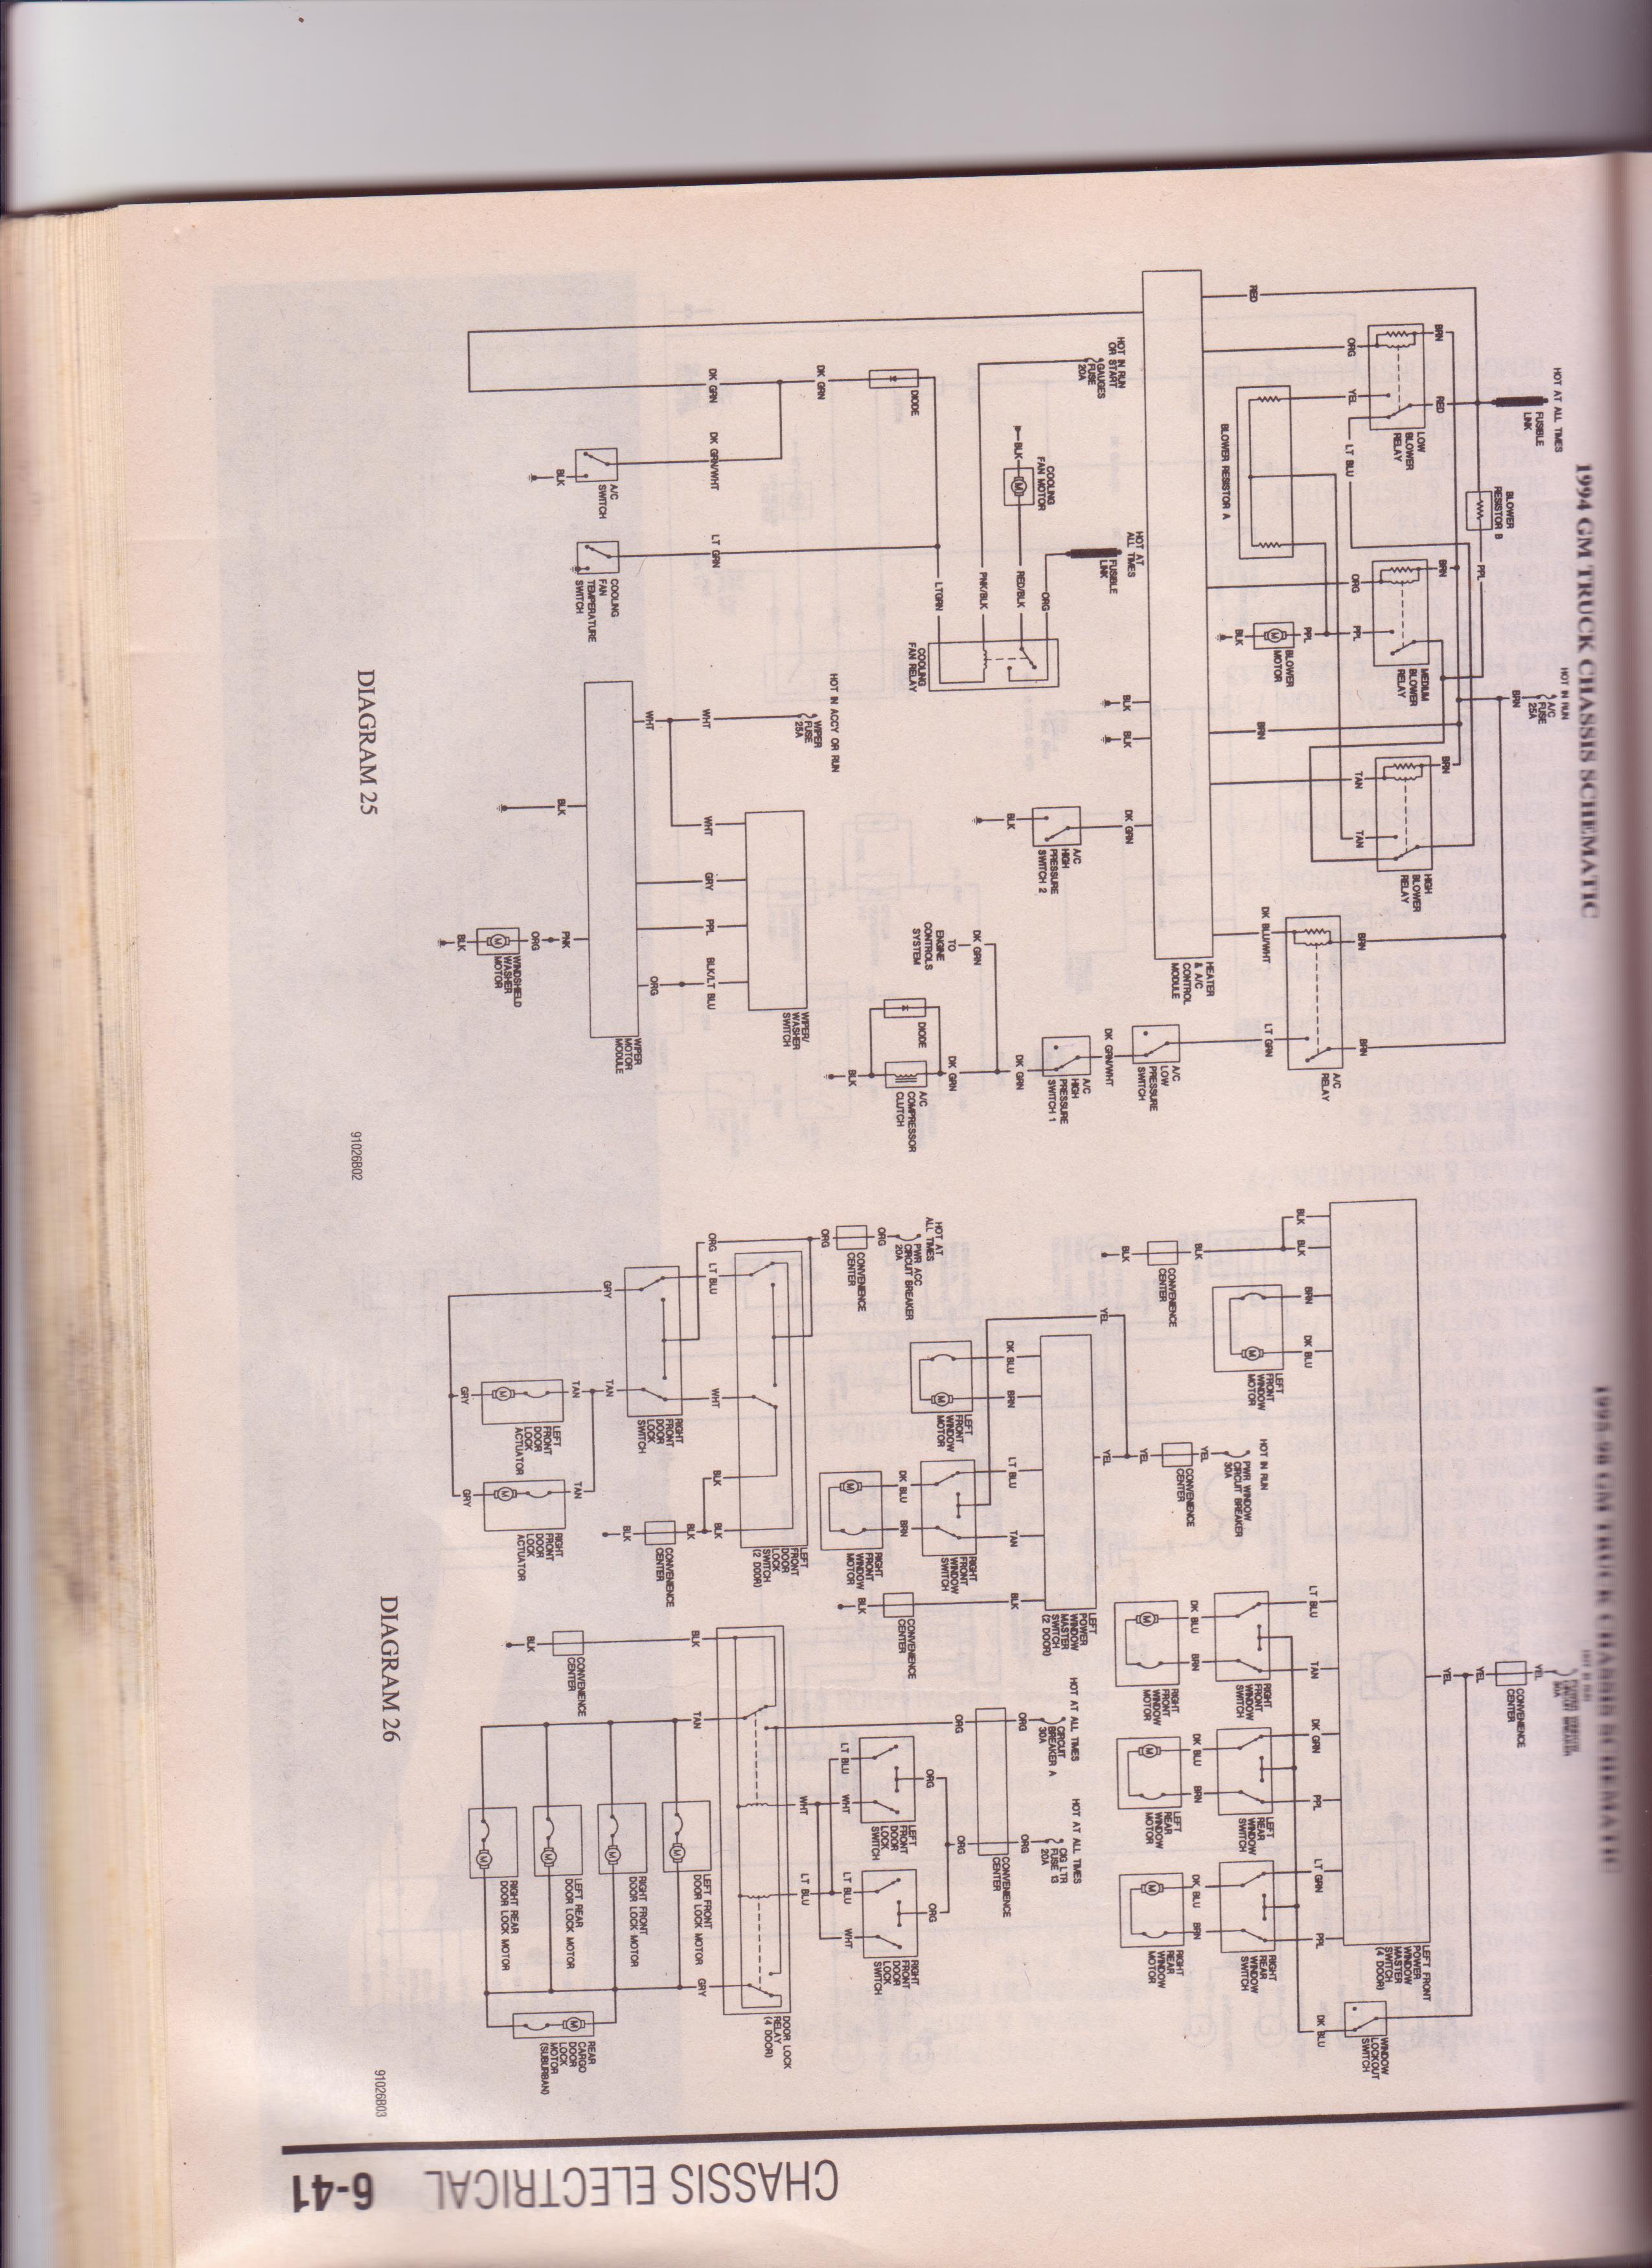 1995 suburban wiring diagram ok 8033  puma air compressor parts diagrams additionally tdci puma  puma air compressor parts diagrams